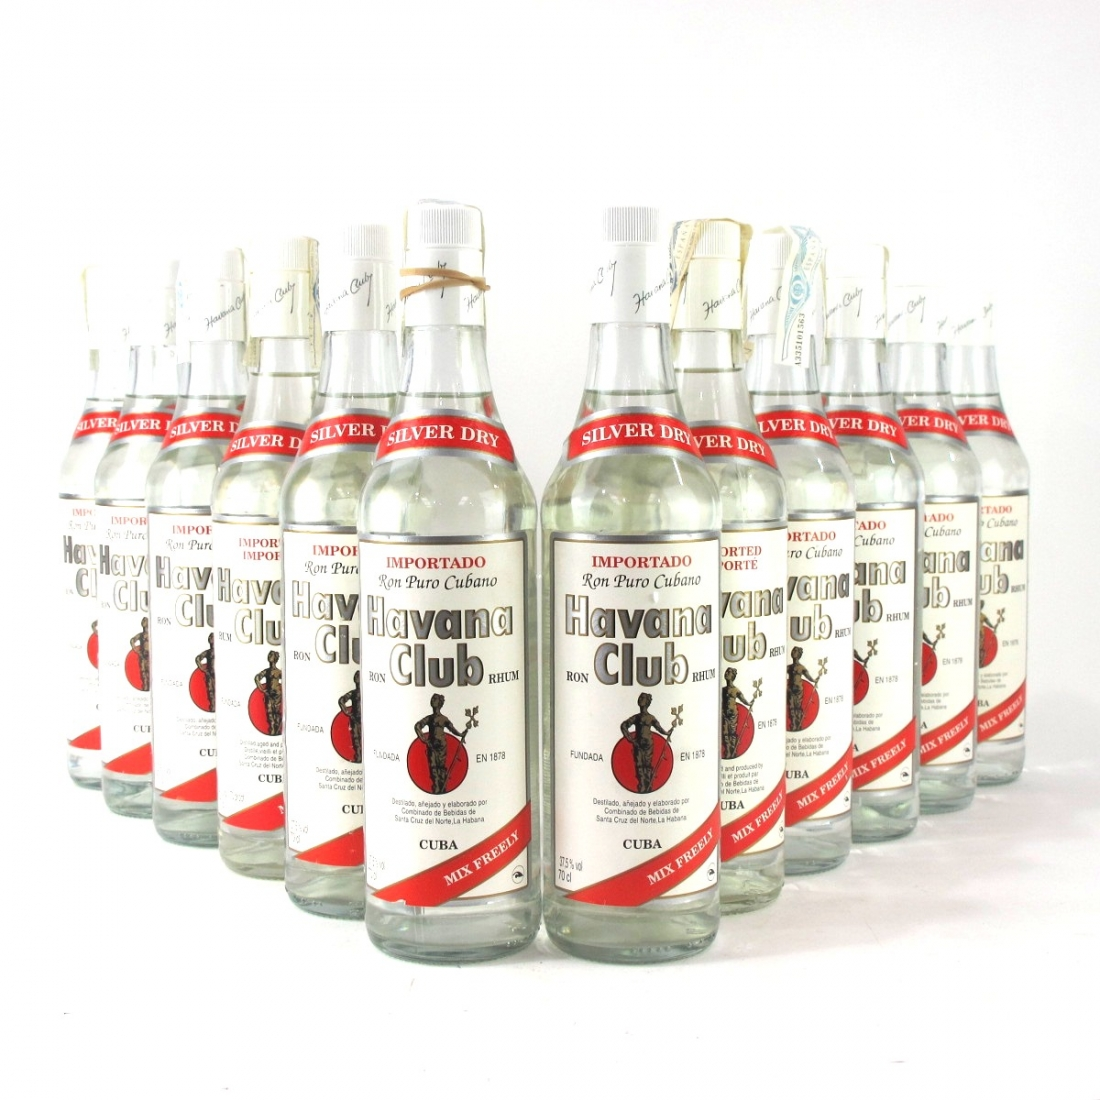 Havana Club Silver Dry Rum x 12